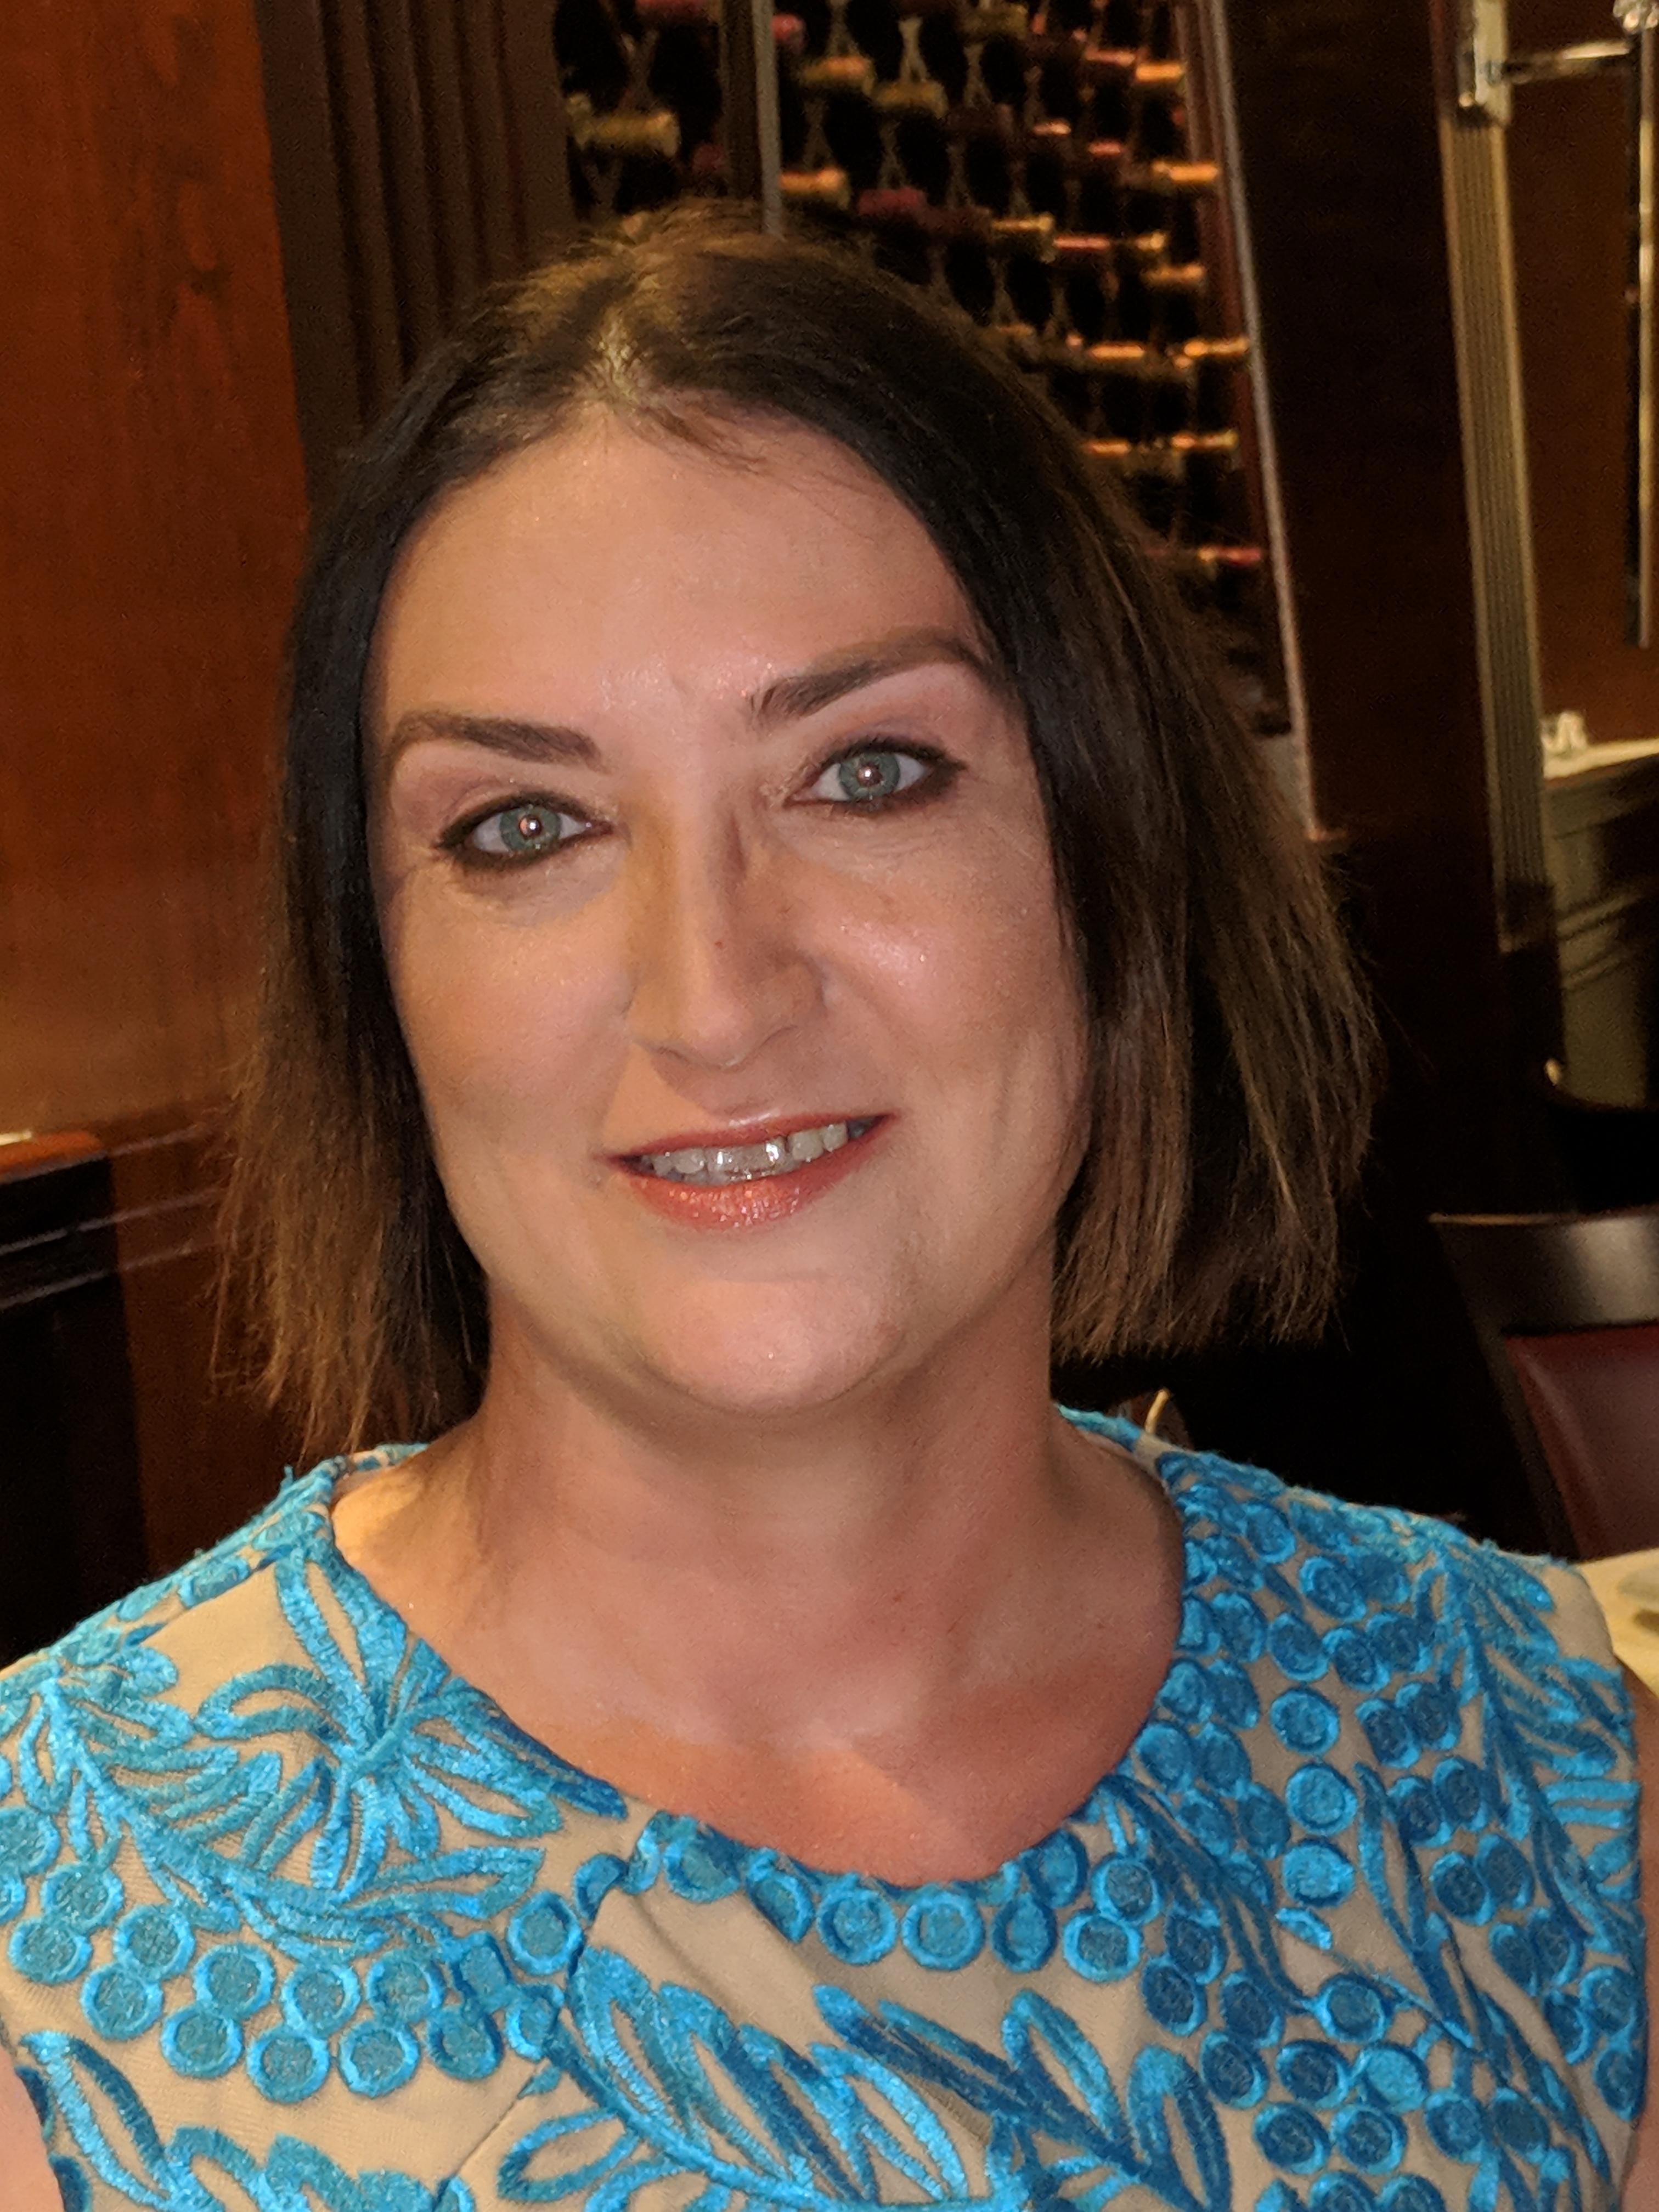 Rheumatoid Arthritis Advocate Lynn Marie Witt